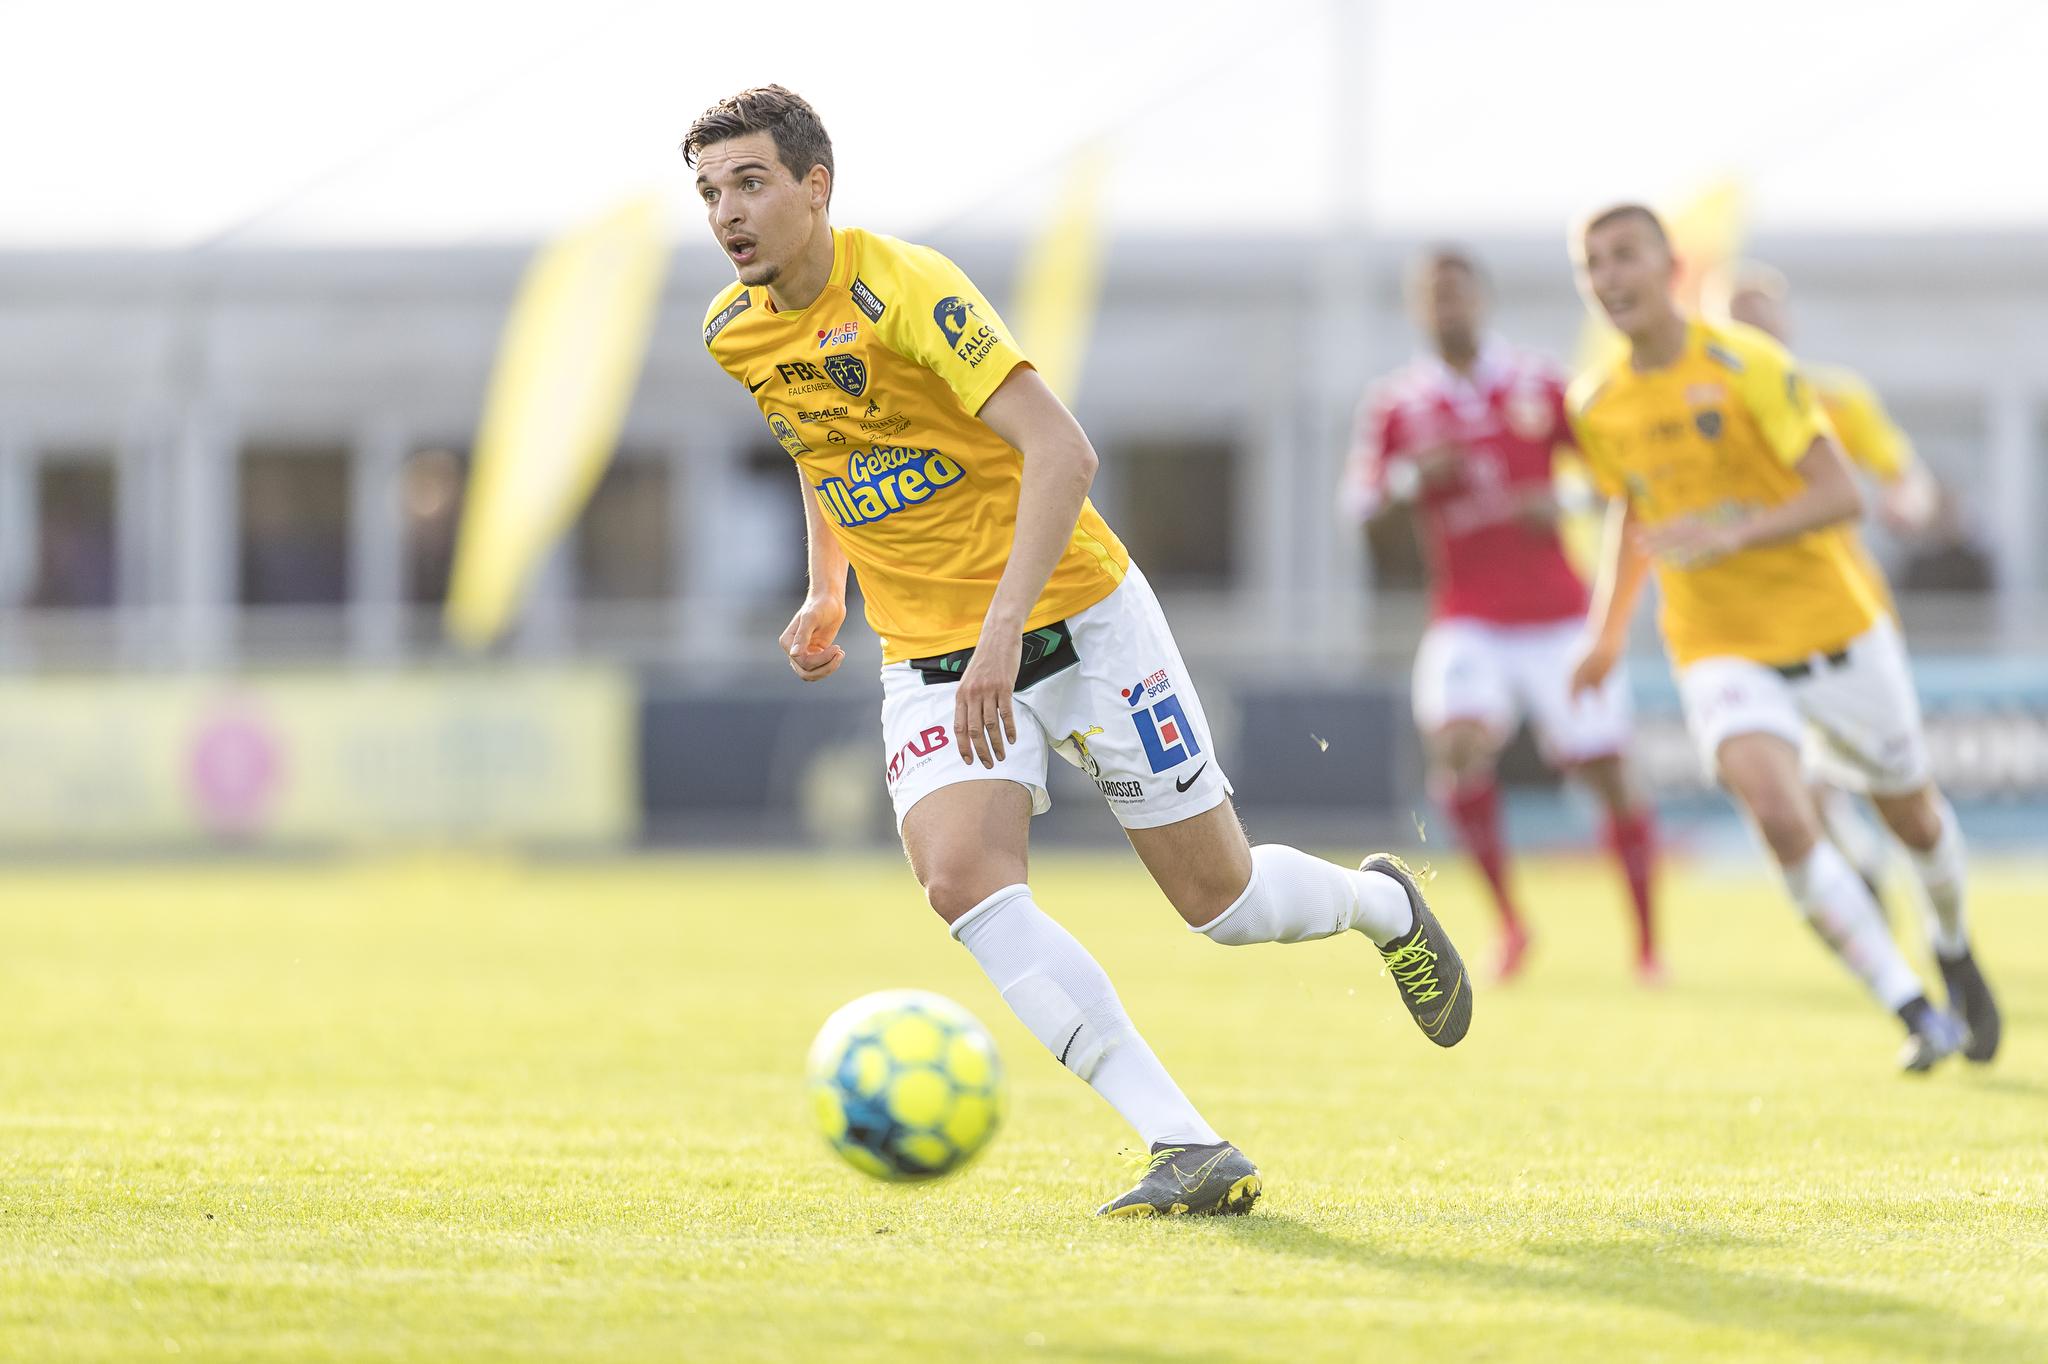 4-6 mot IFK Norrköping